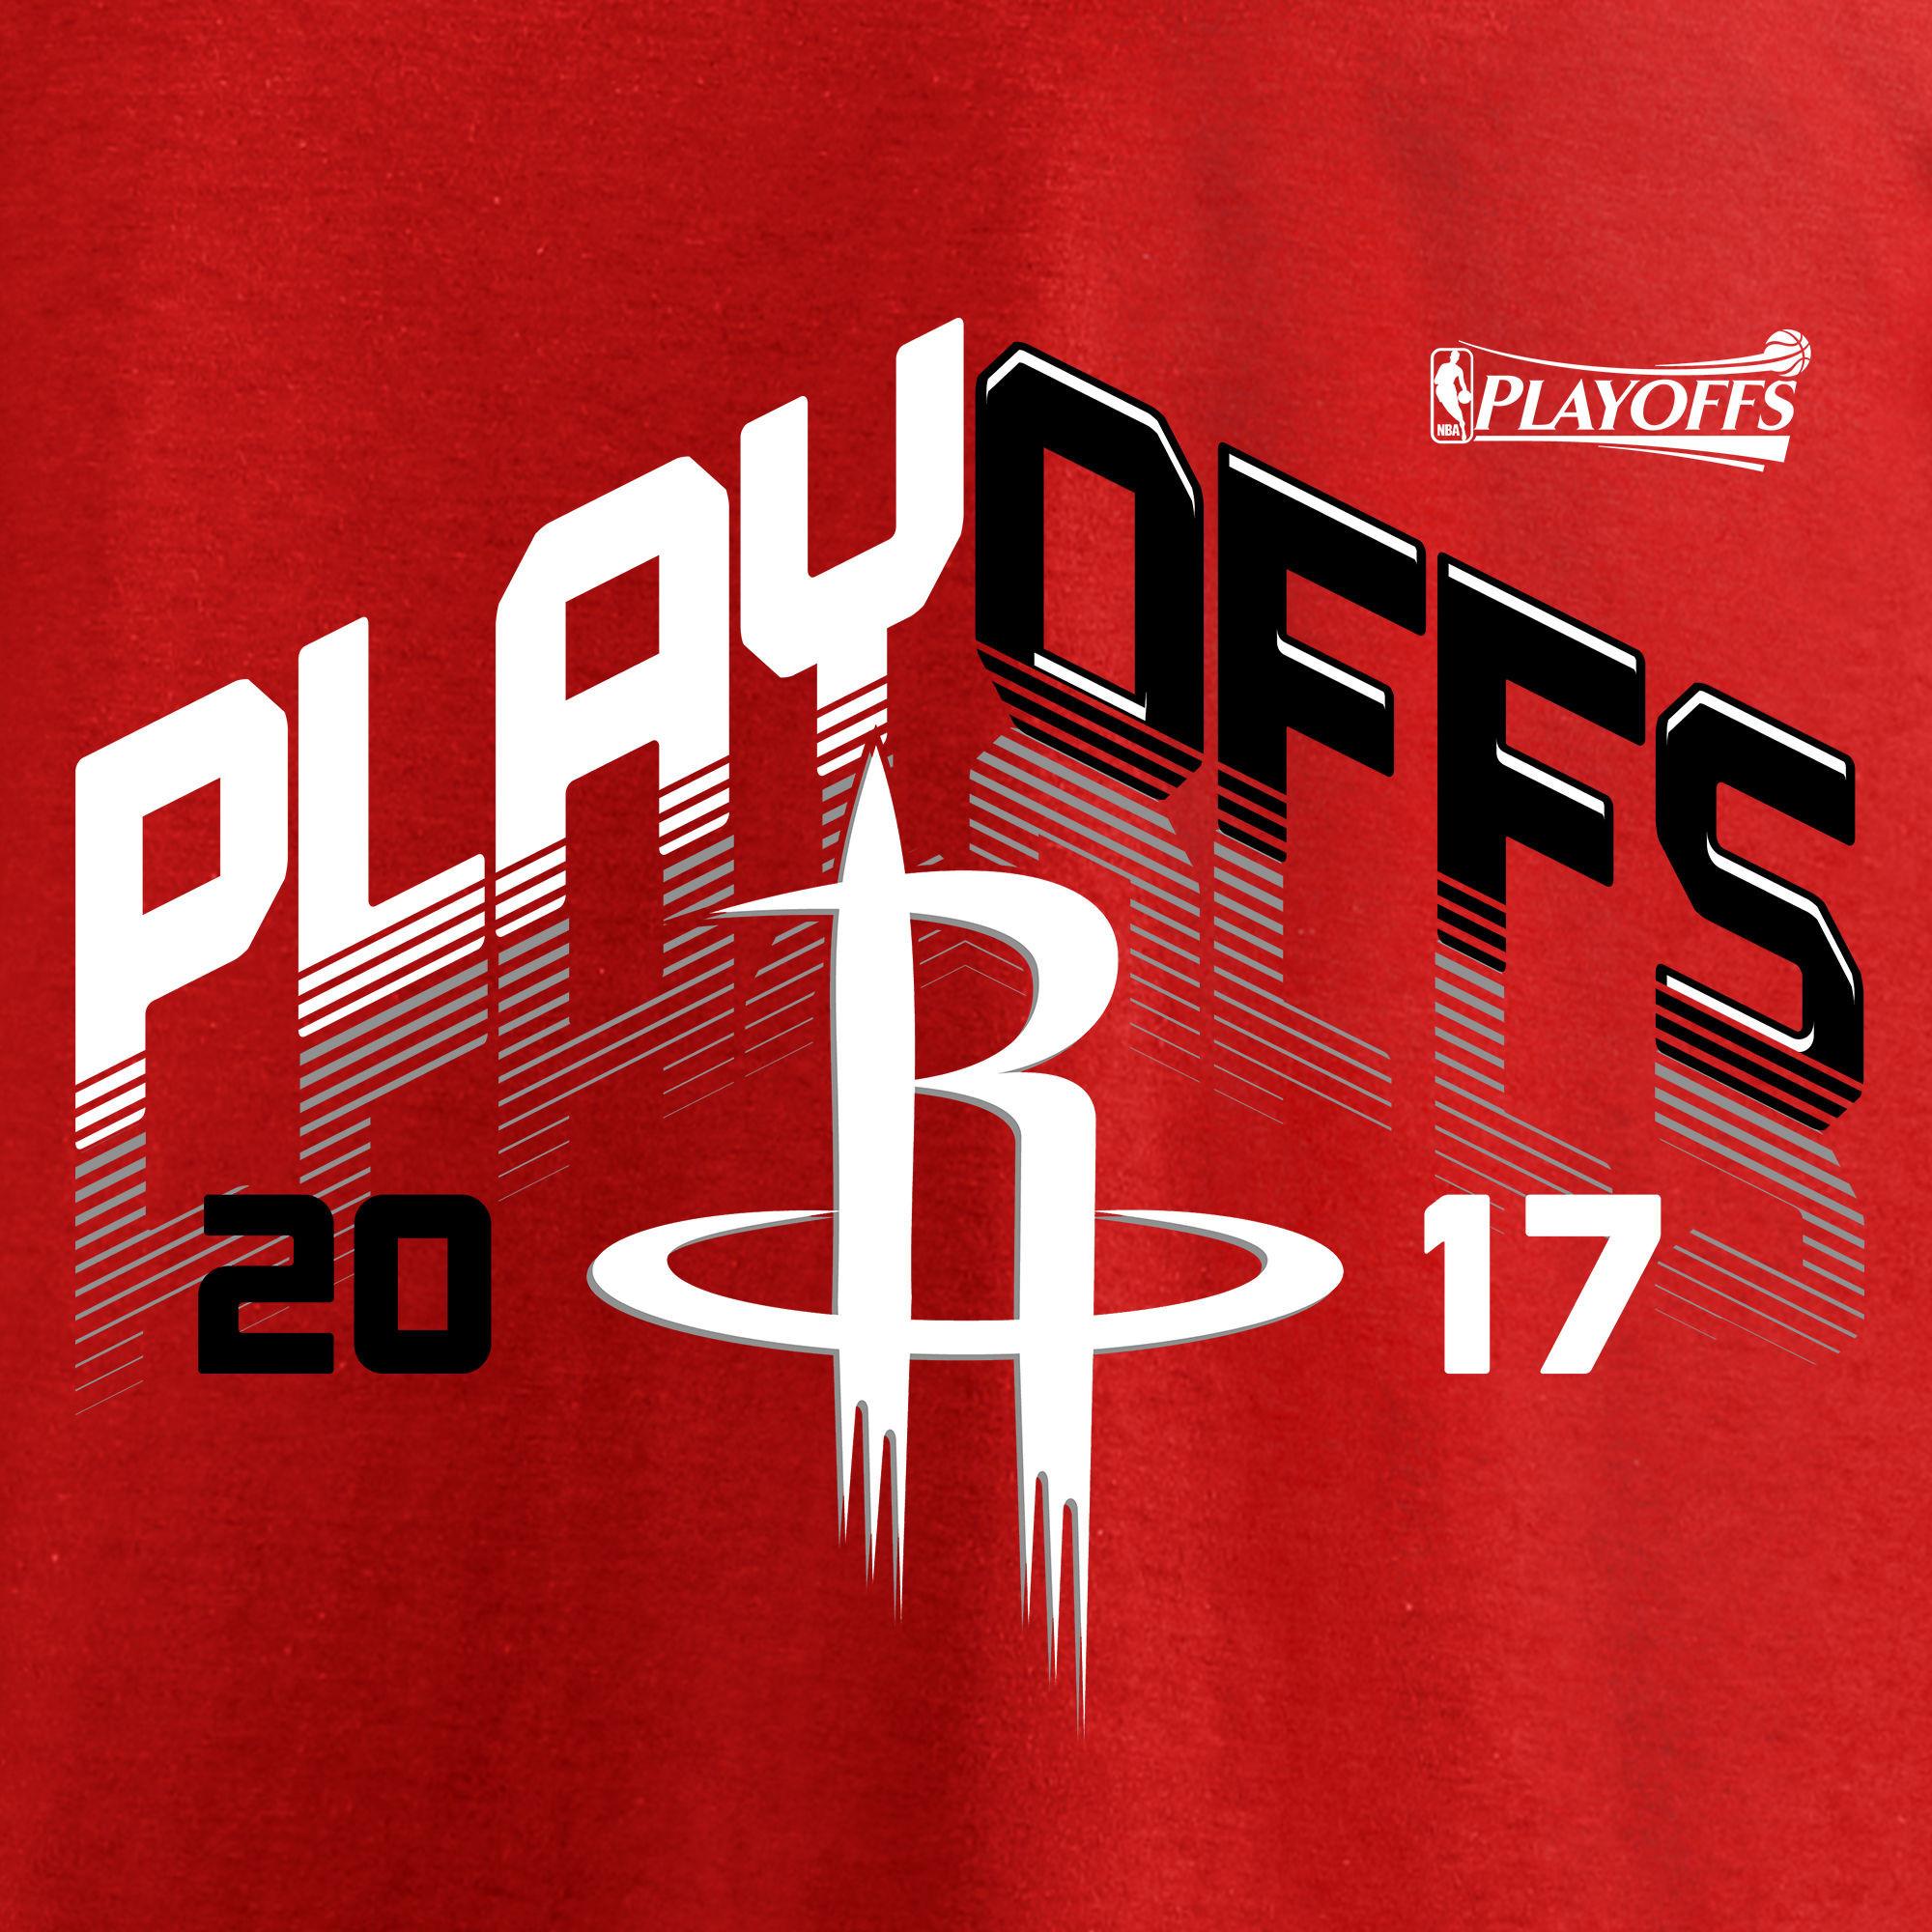 Houston Rockets   2017 NBA Playoffs